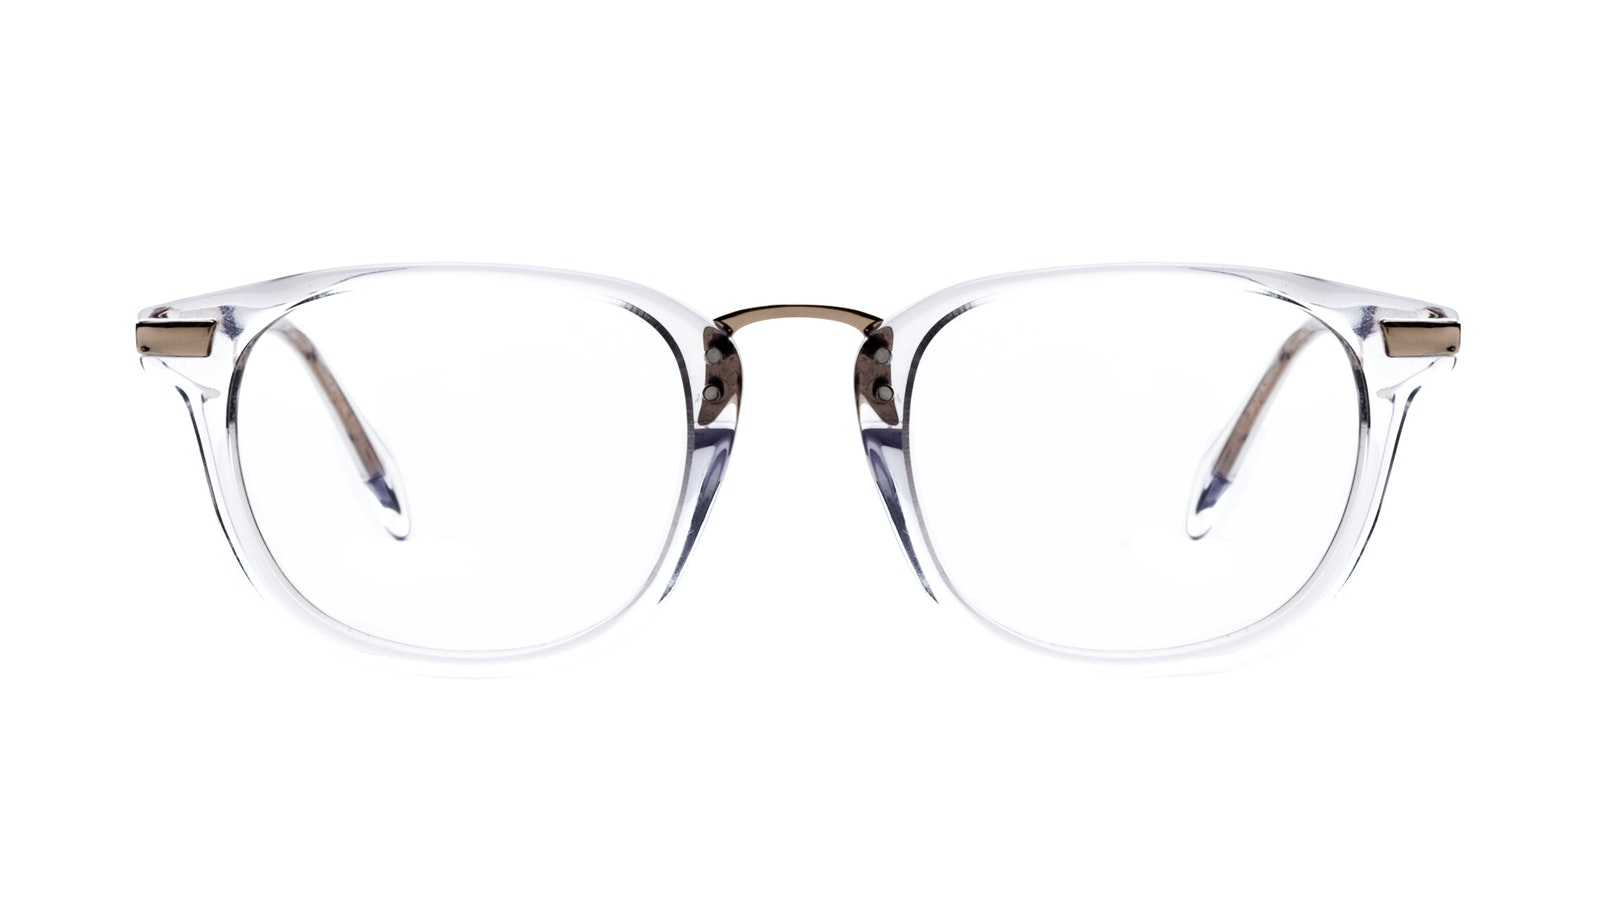 Affordable Fashion Glasses Rectangle Square Eyeglasses Men Daze Gold Diamond